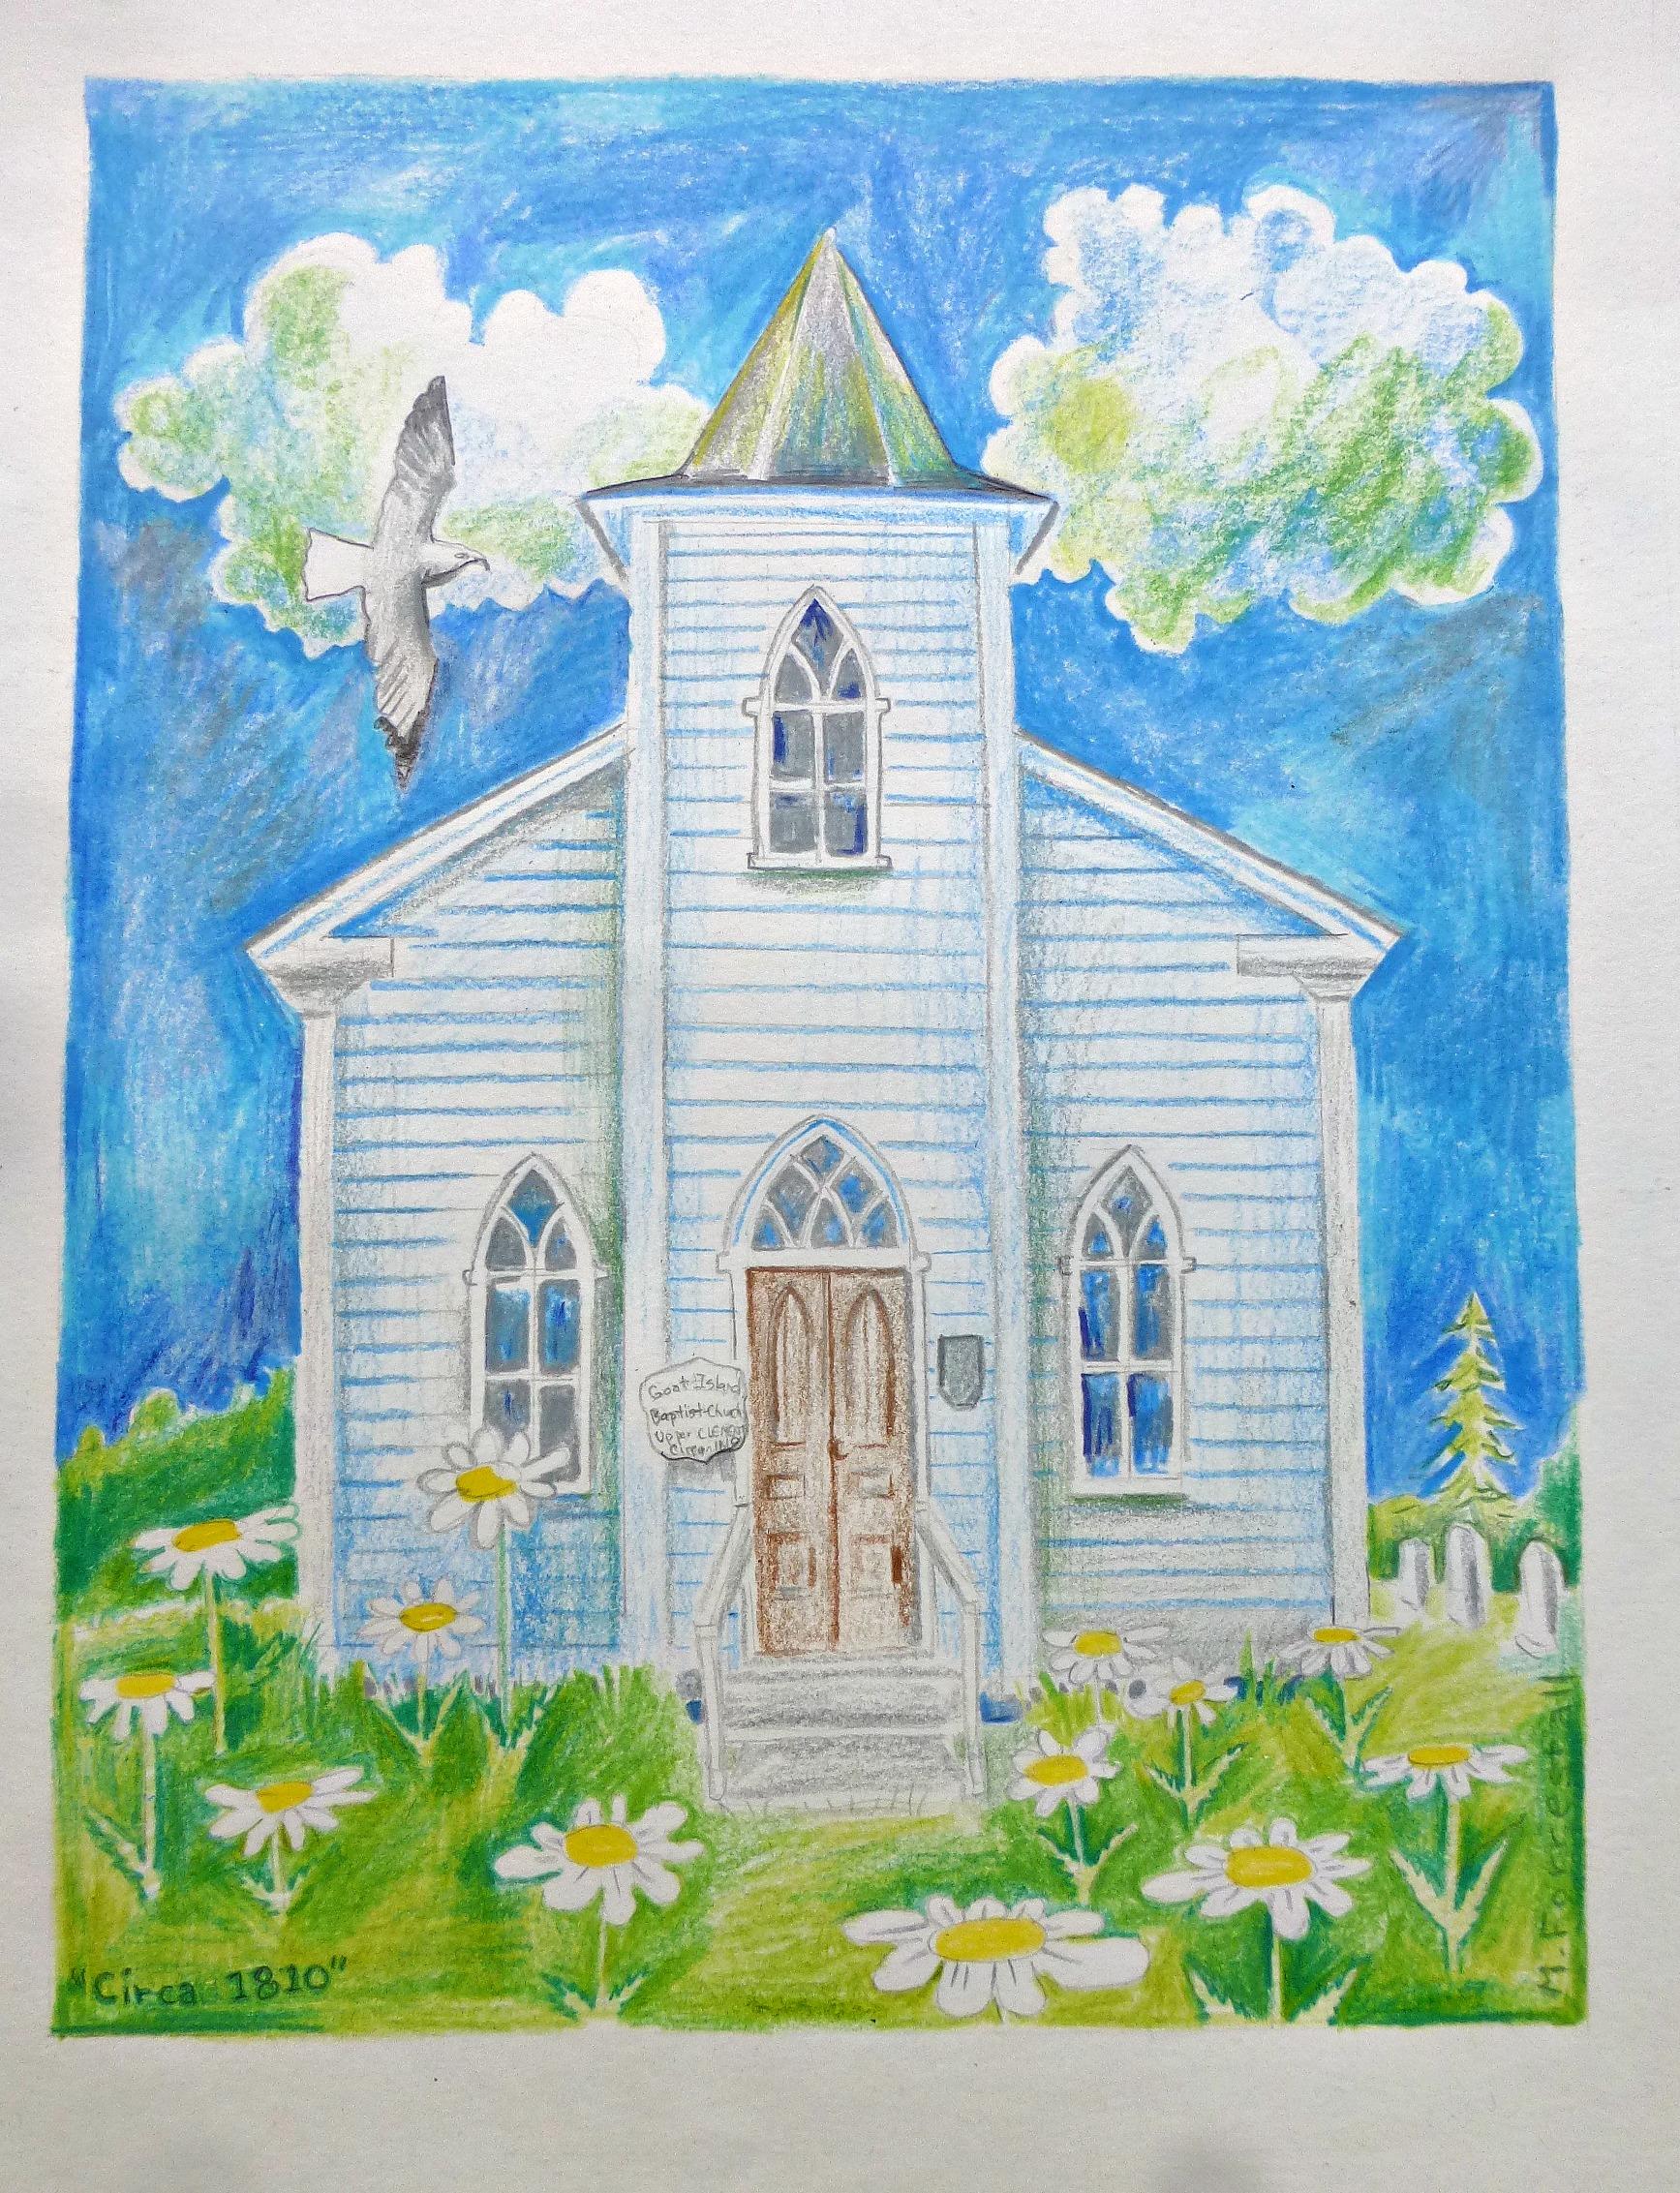 NOVA CHURCH Goat Island SHARP